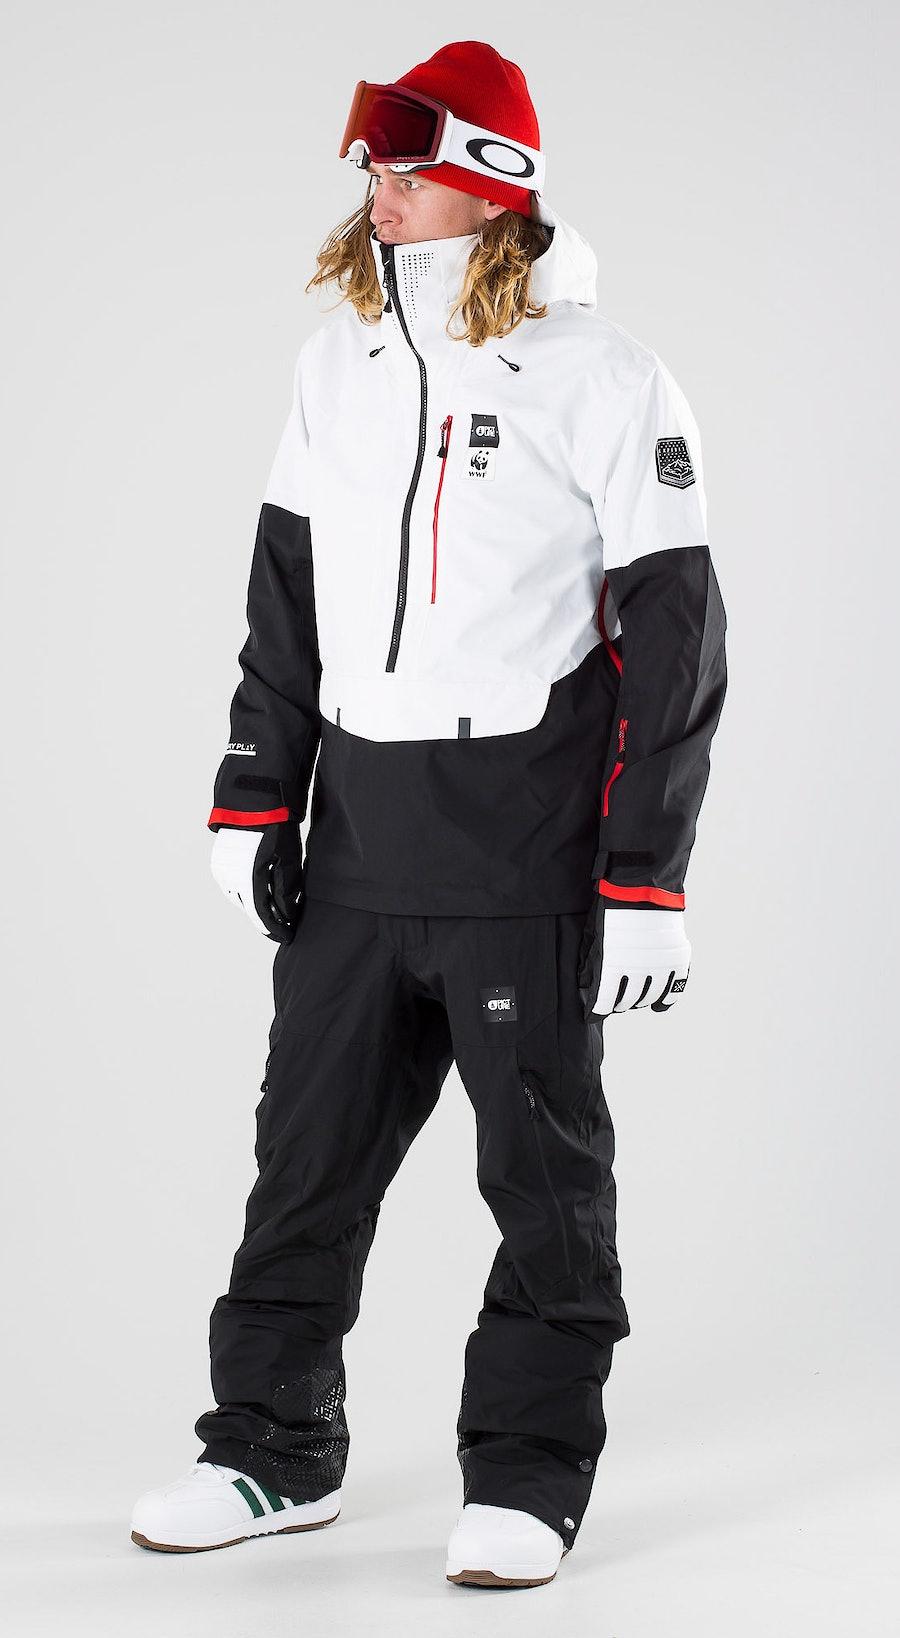 Picture WWF Anton WWBlack & White Snowboardkläder Multi